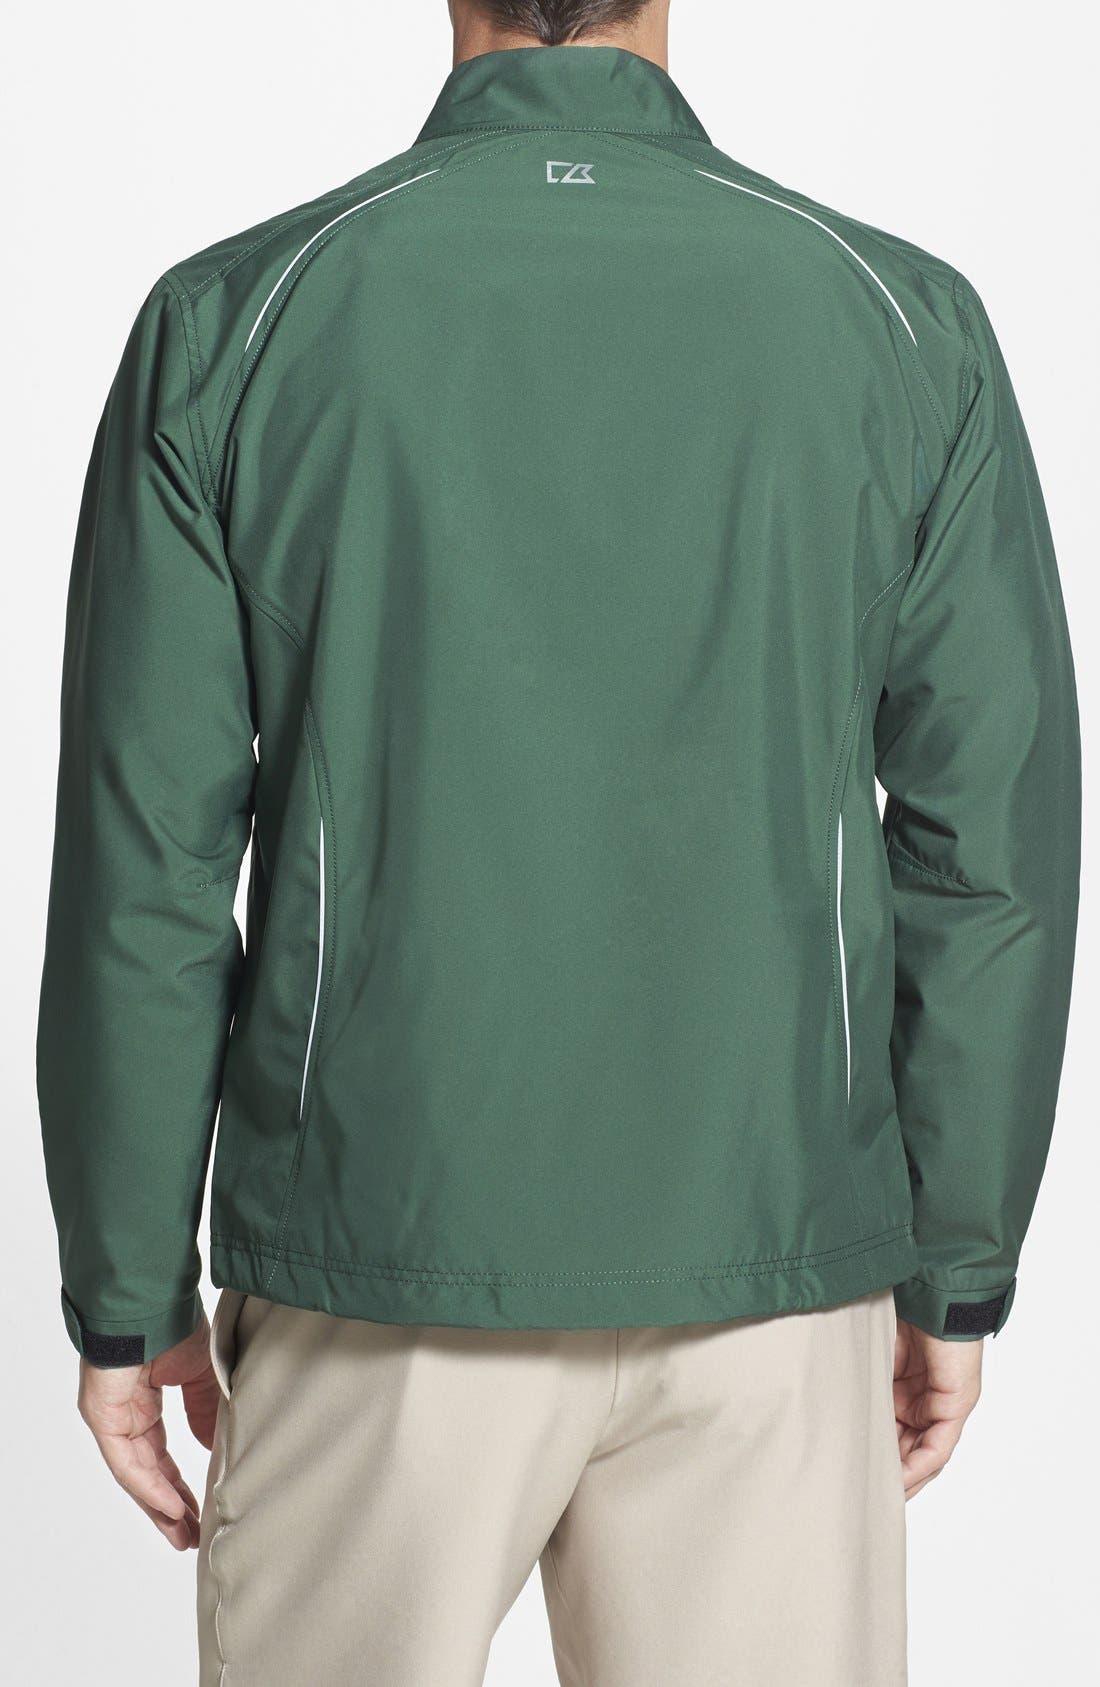 Alternate Image 2  - Cutter & Buck New York Jets - Beacon WeatherTec Wind & Water Resistant Jacket